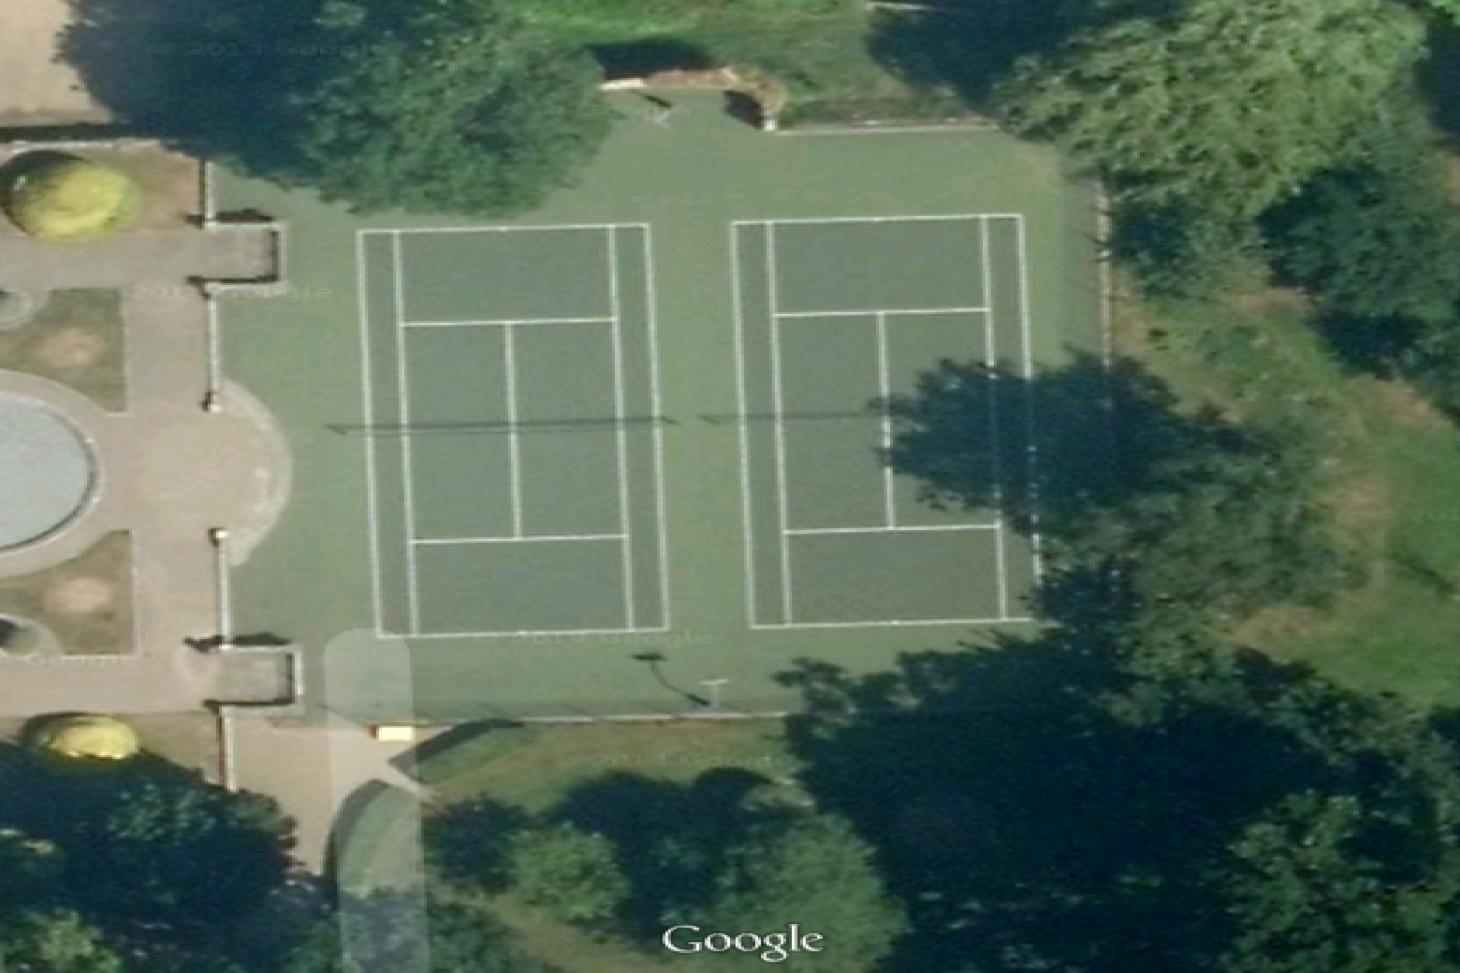 Hillingdon Court Park - Tennis Outdoor | Hard (macadam) tennis court